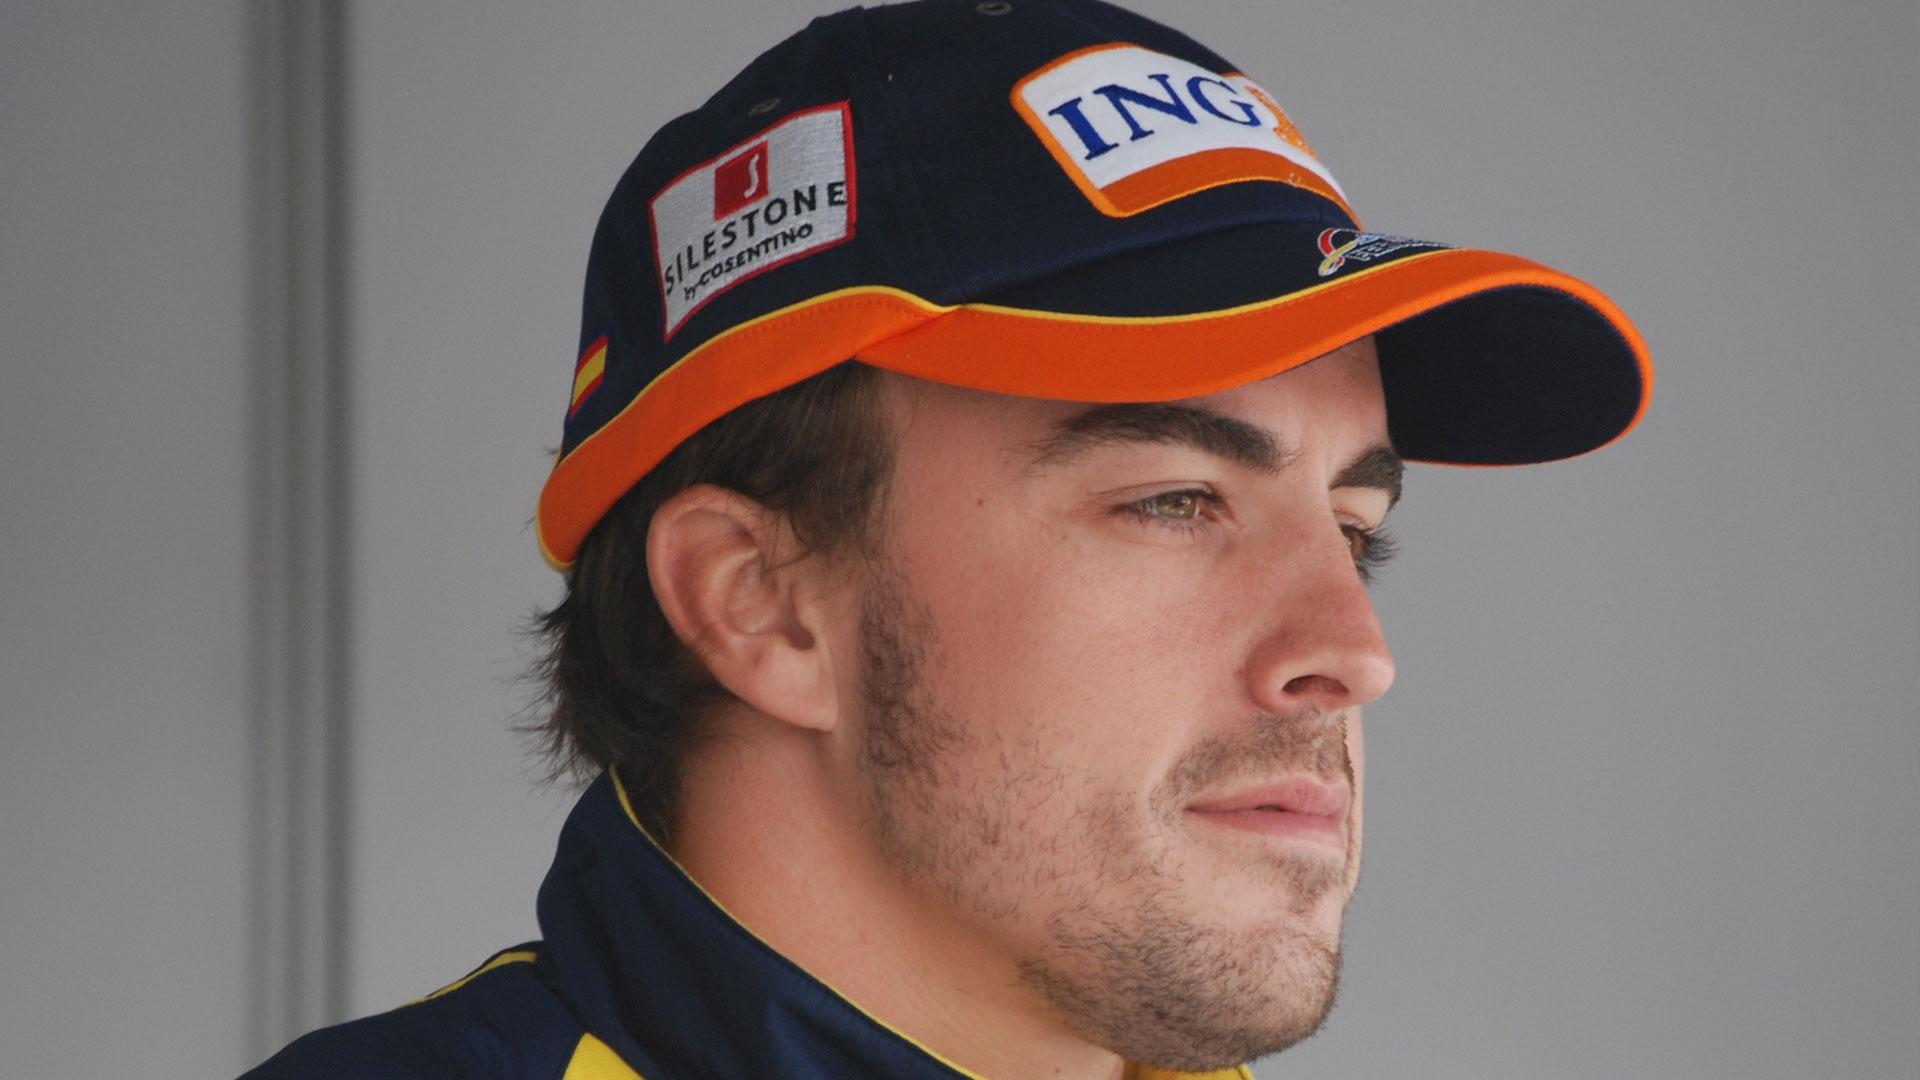 Alonso 30 años hero asset